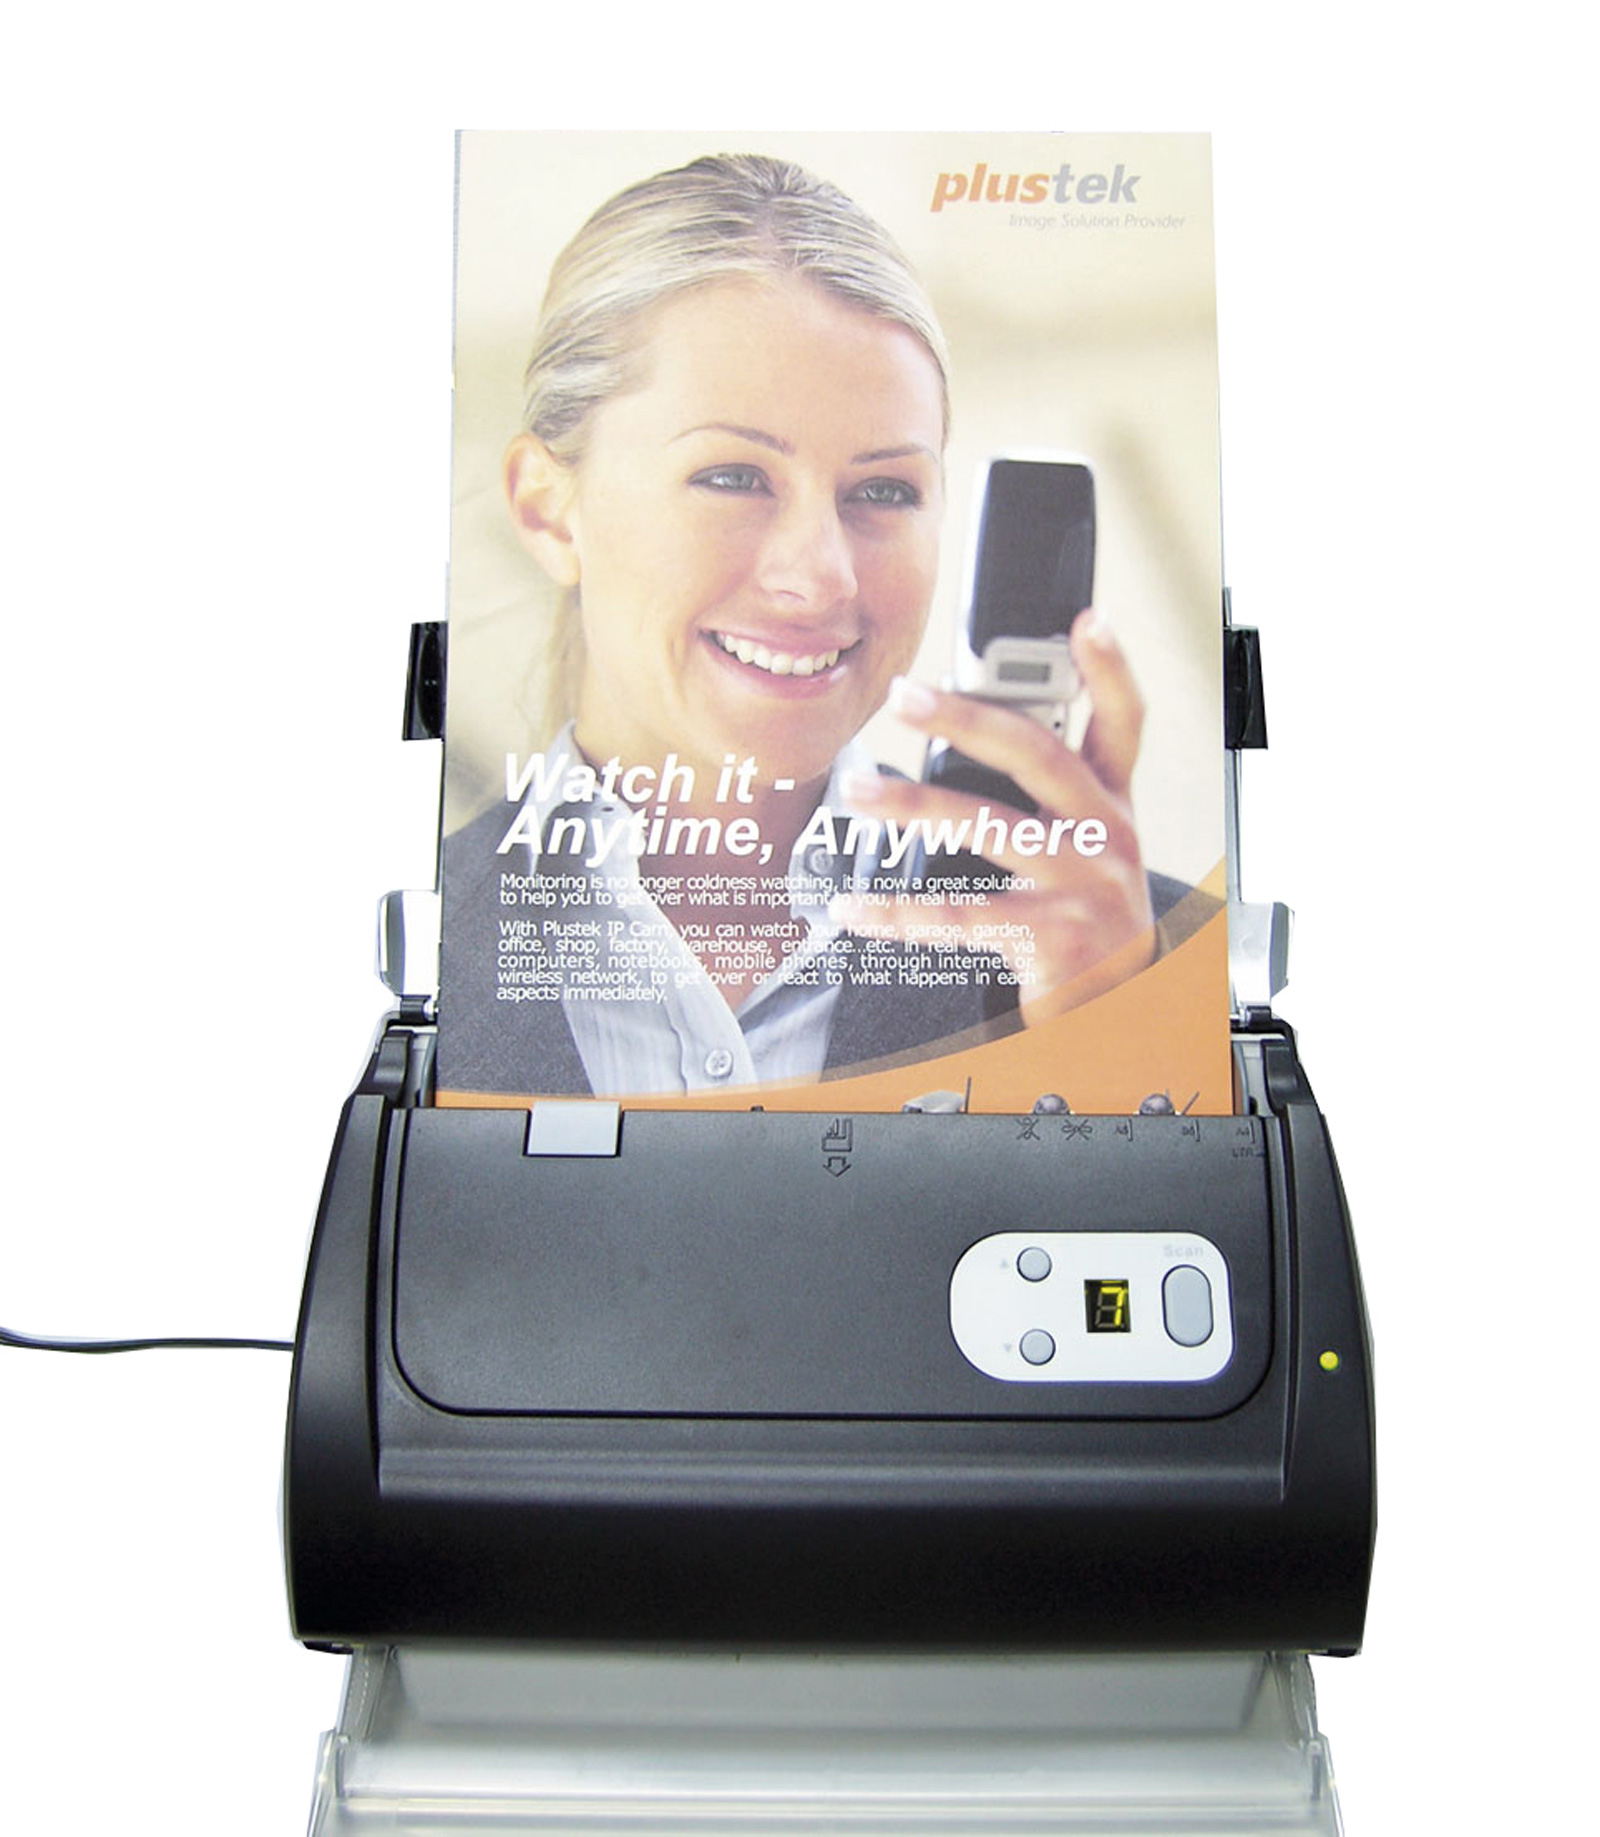 Plustek SmartOffice PS286 Plus - Dokumentenscanner - 600x600 dpi - A3, A4 USB, USB 2.0